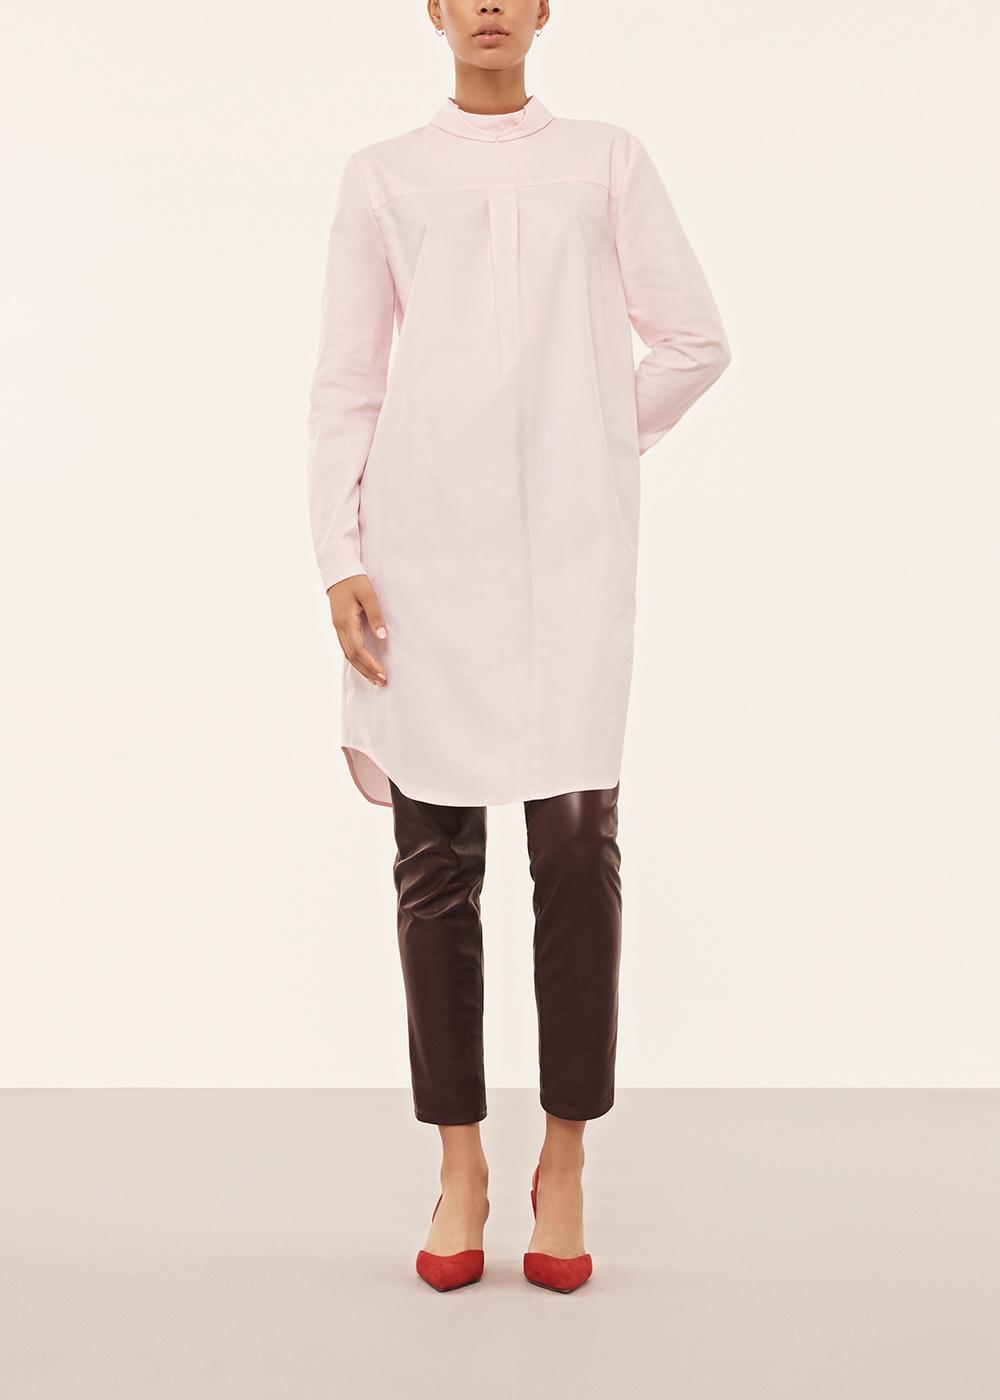 Pink Reversed Button Down Shirt Dress - Alexander Lewis